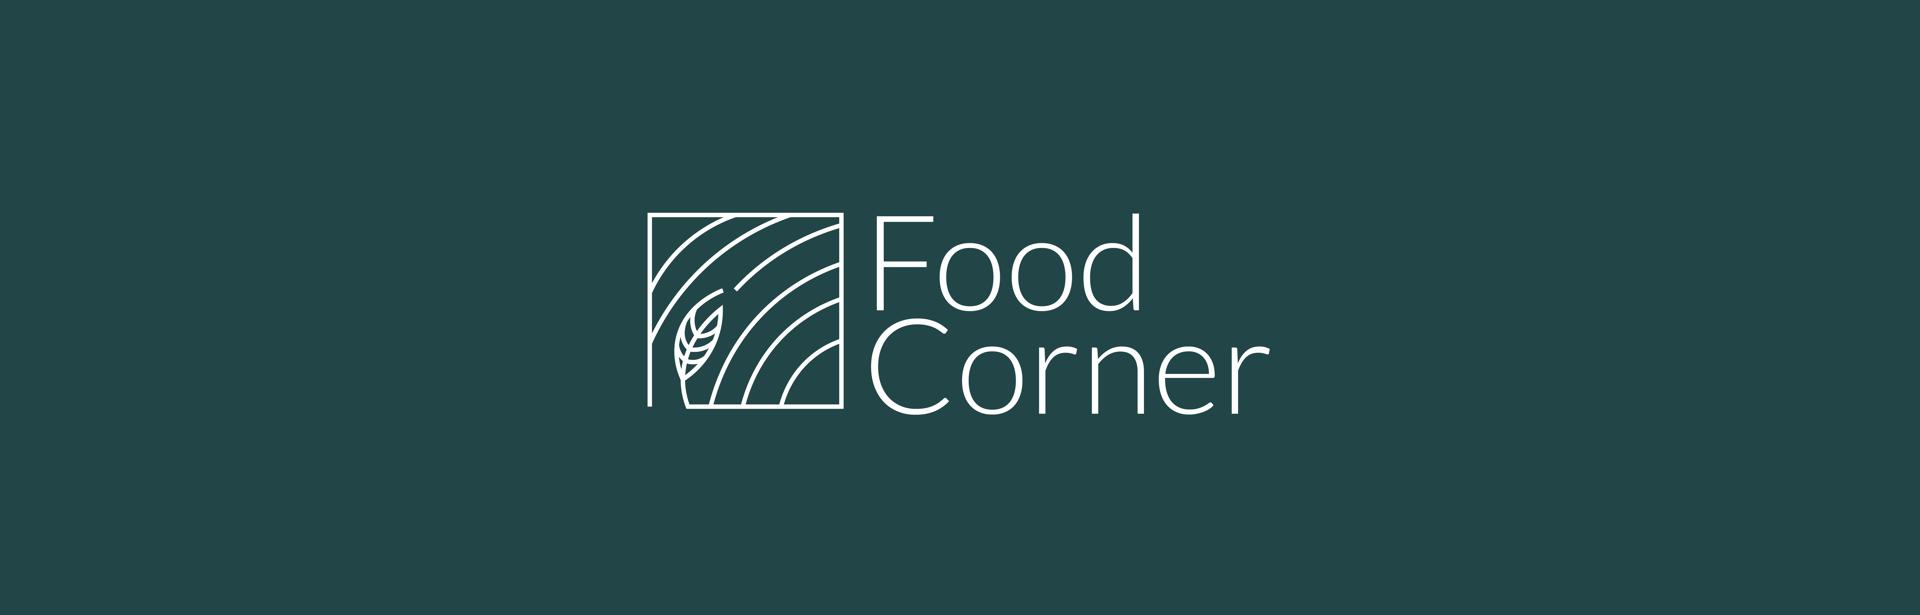 Food Corner